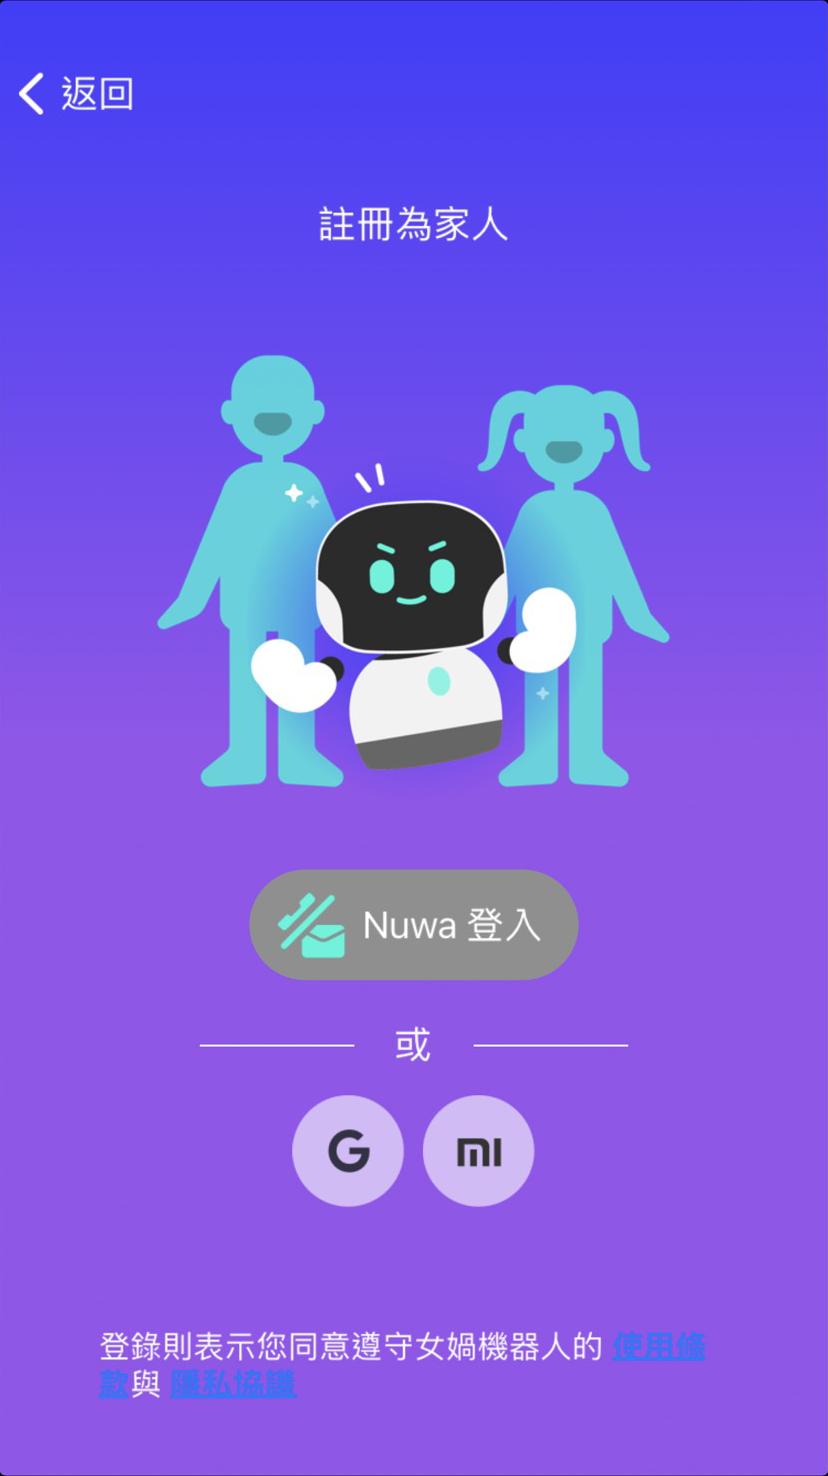 NUWASpace_Login-6